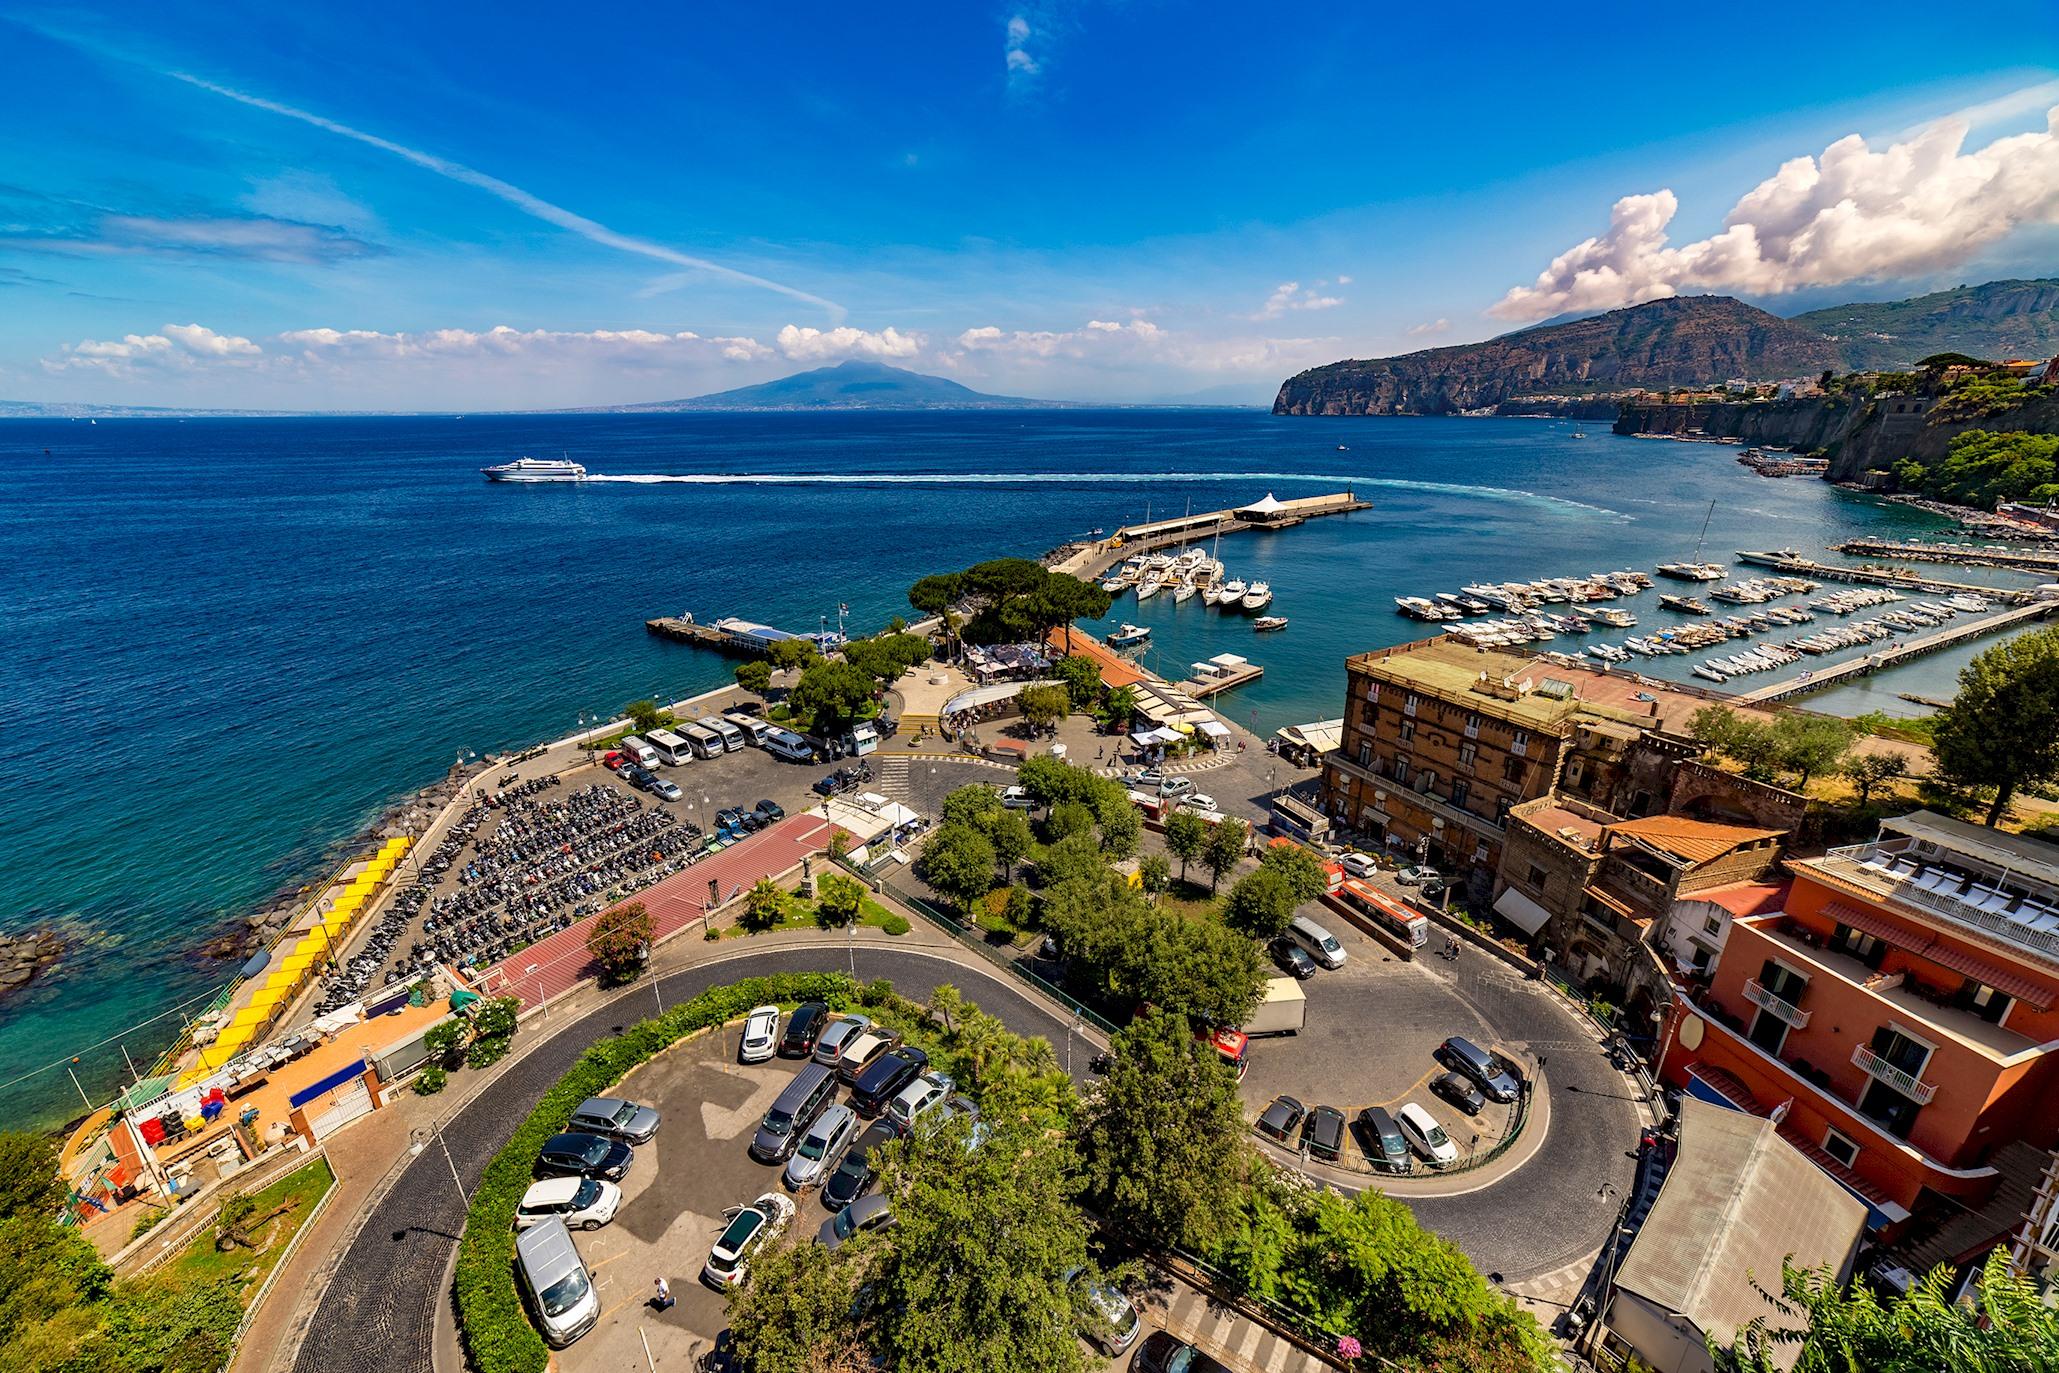 Apartment Ginestra Beach Suite - Marina del Cantone photo 20143343